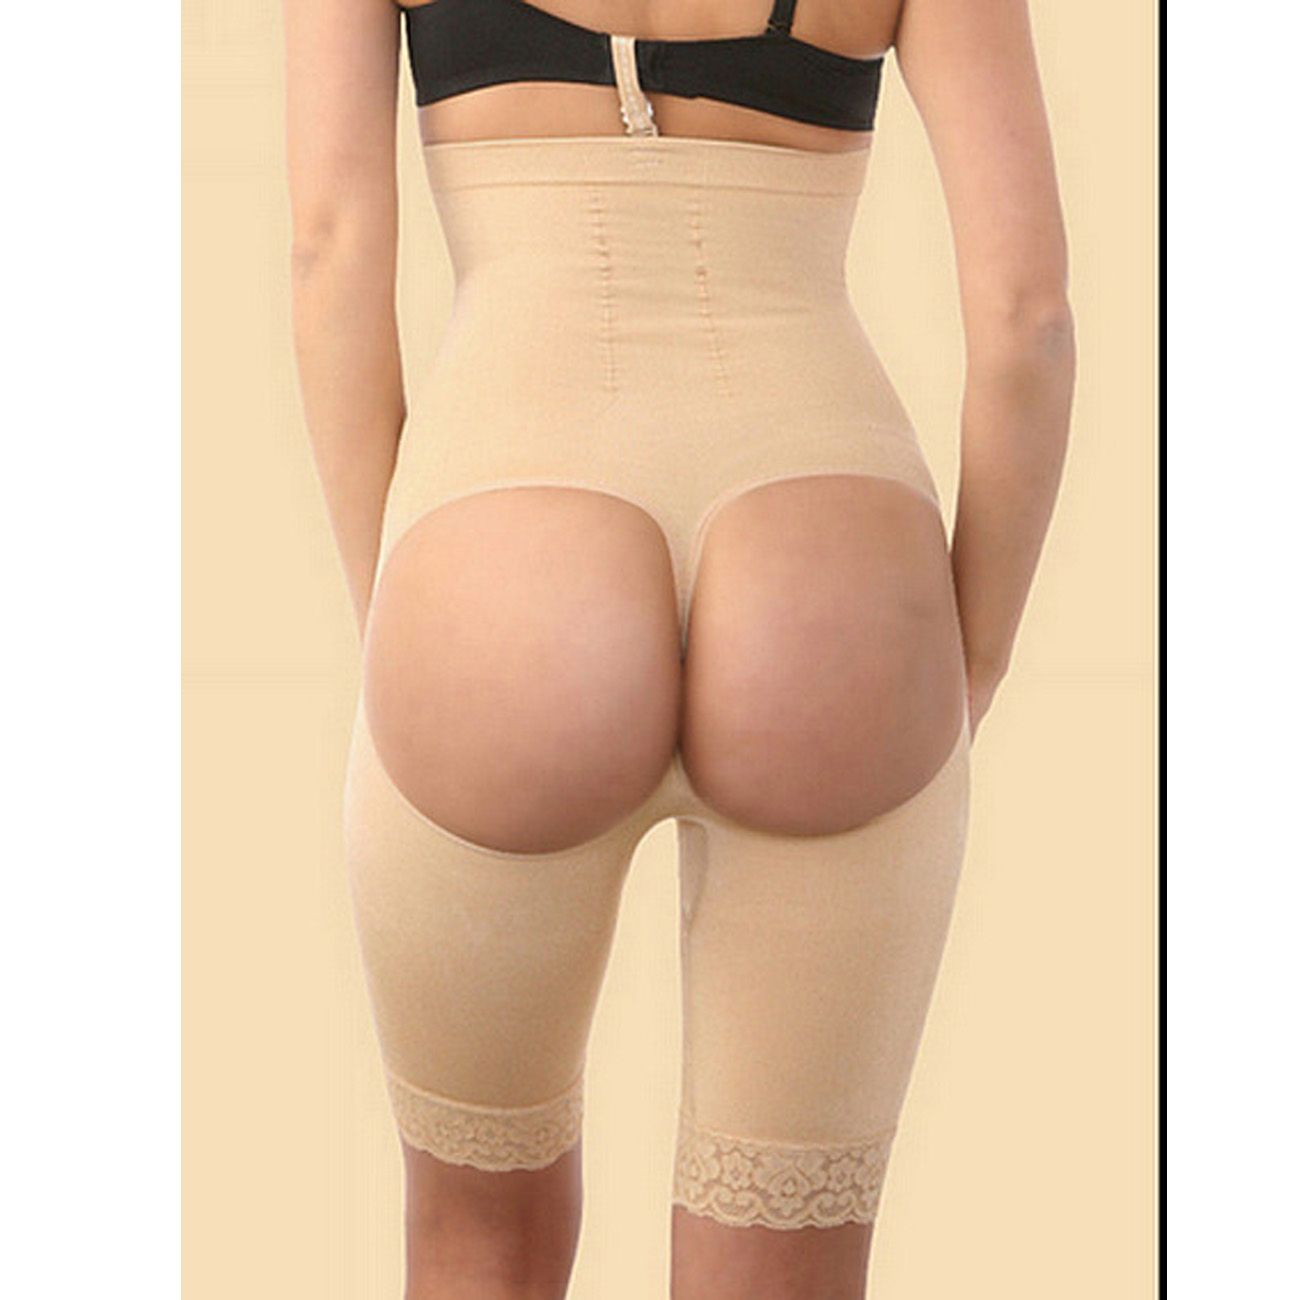 d25b286d5 Women sexy underwear